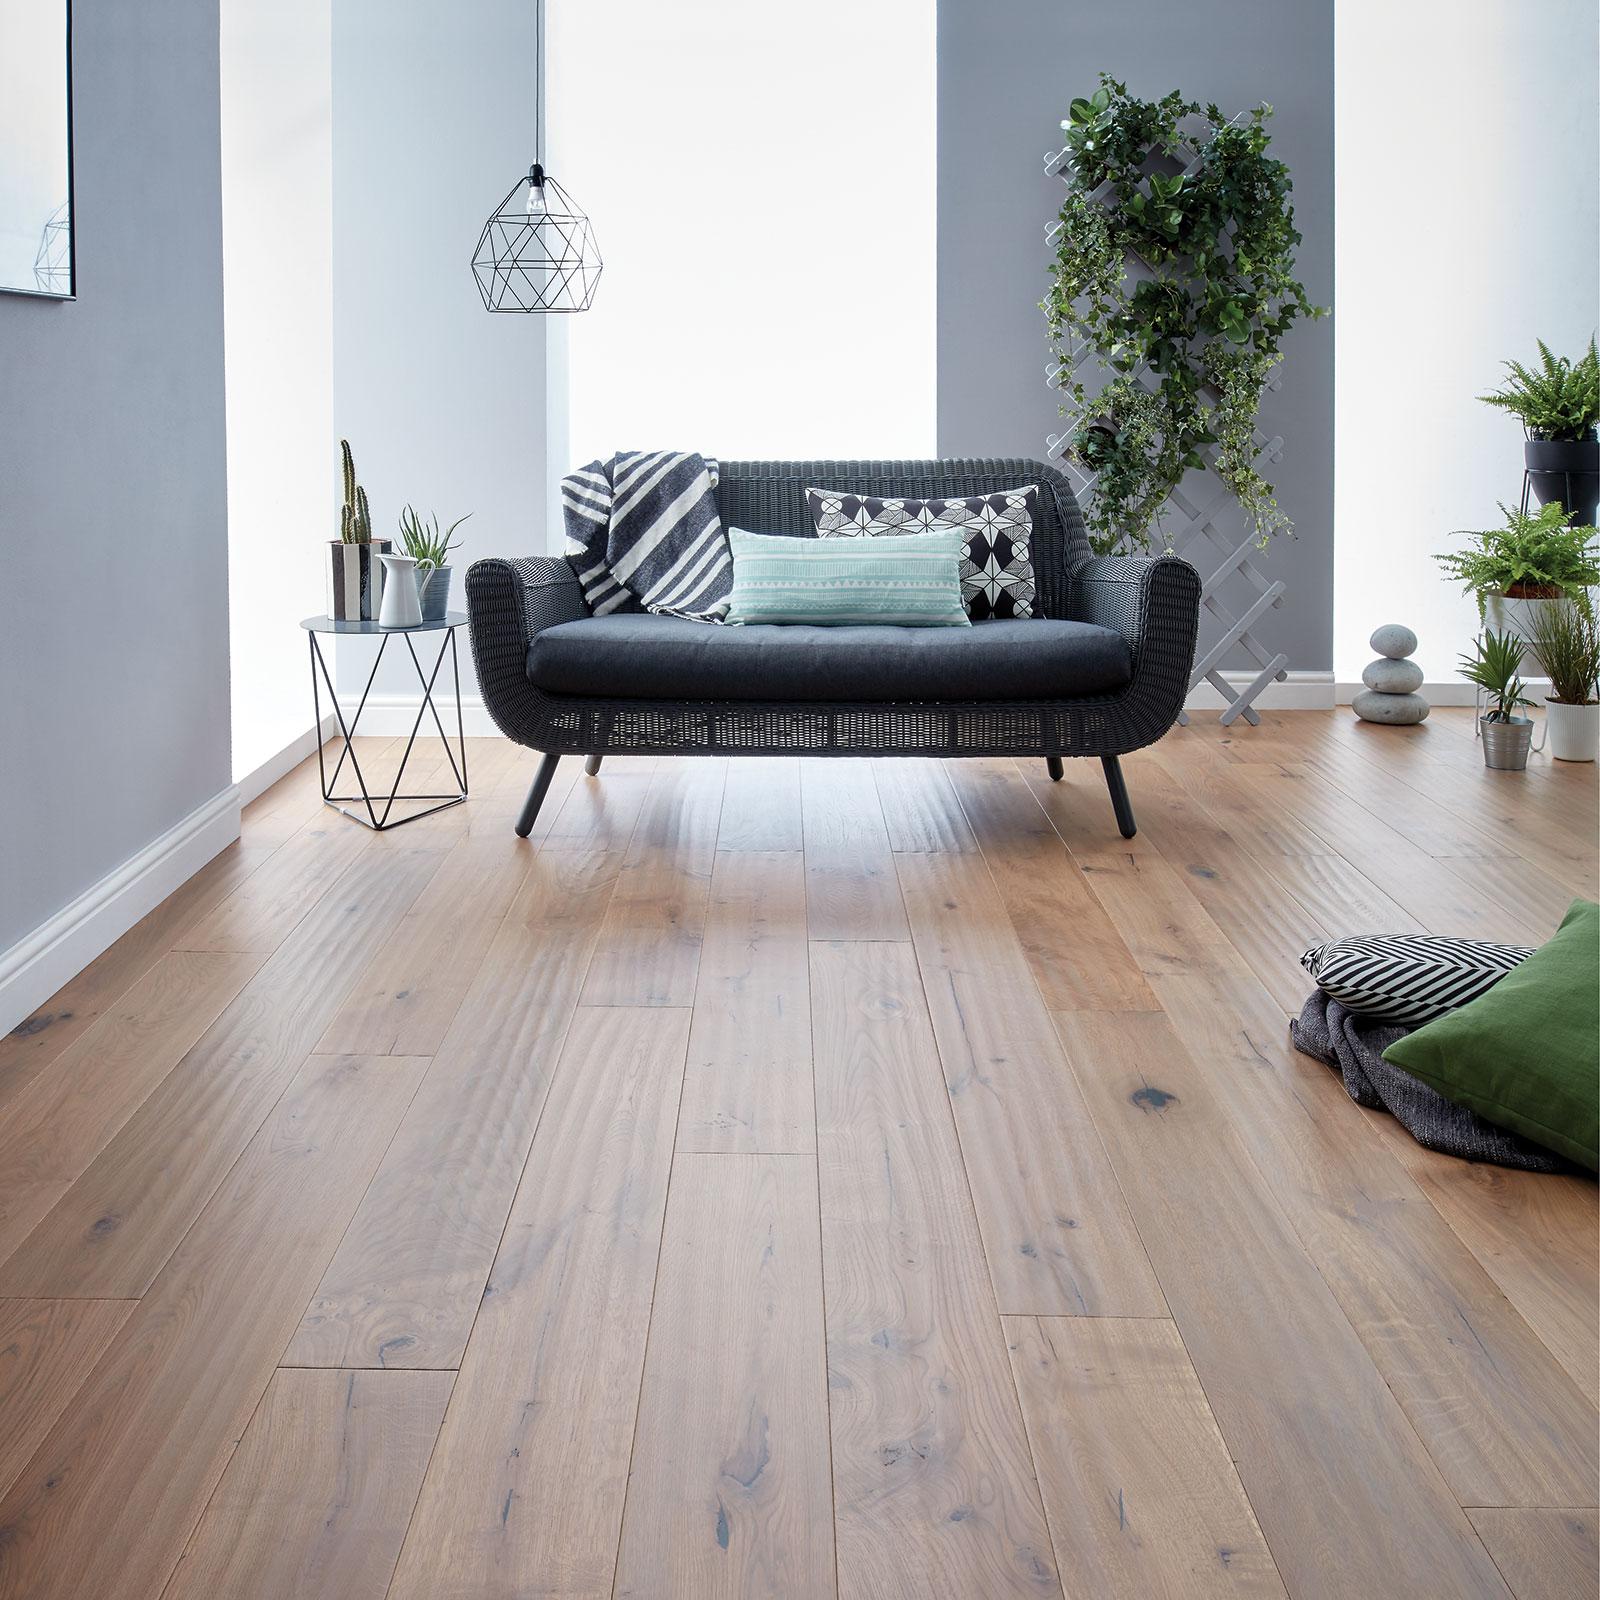 berkeley washed oak wood flooring